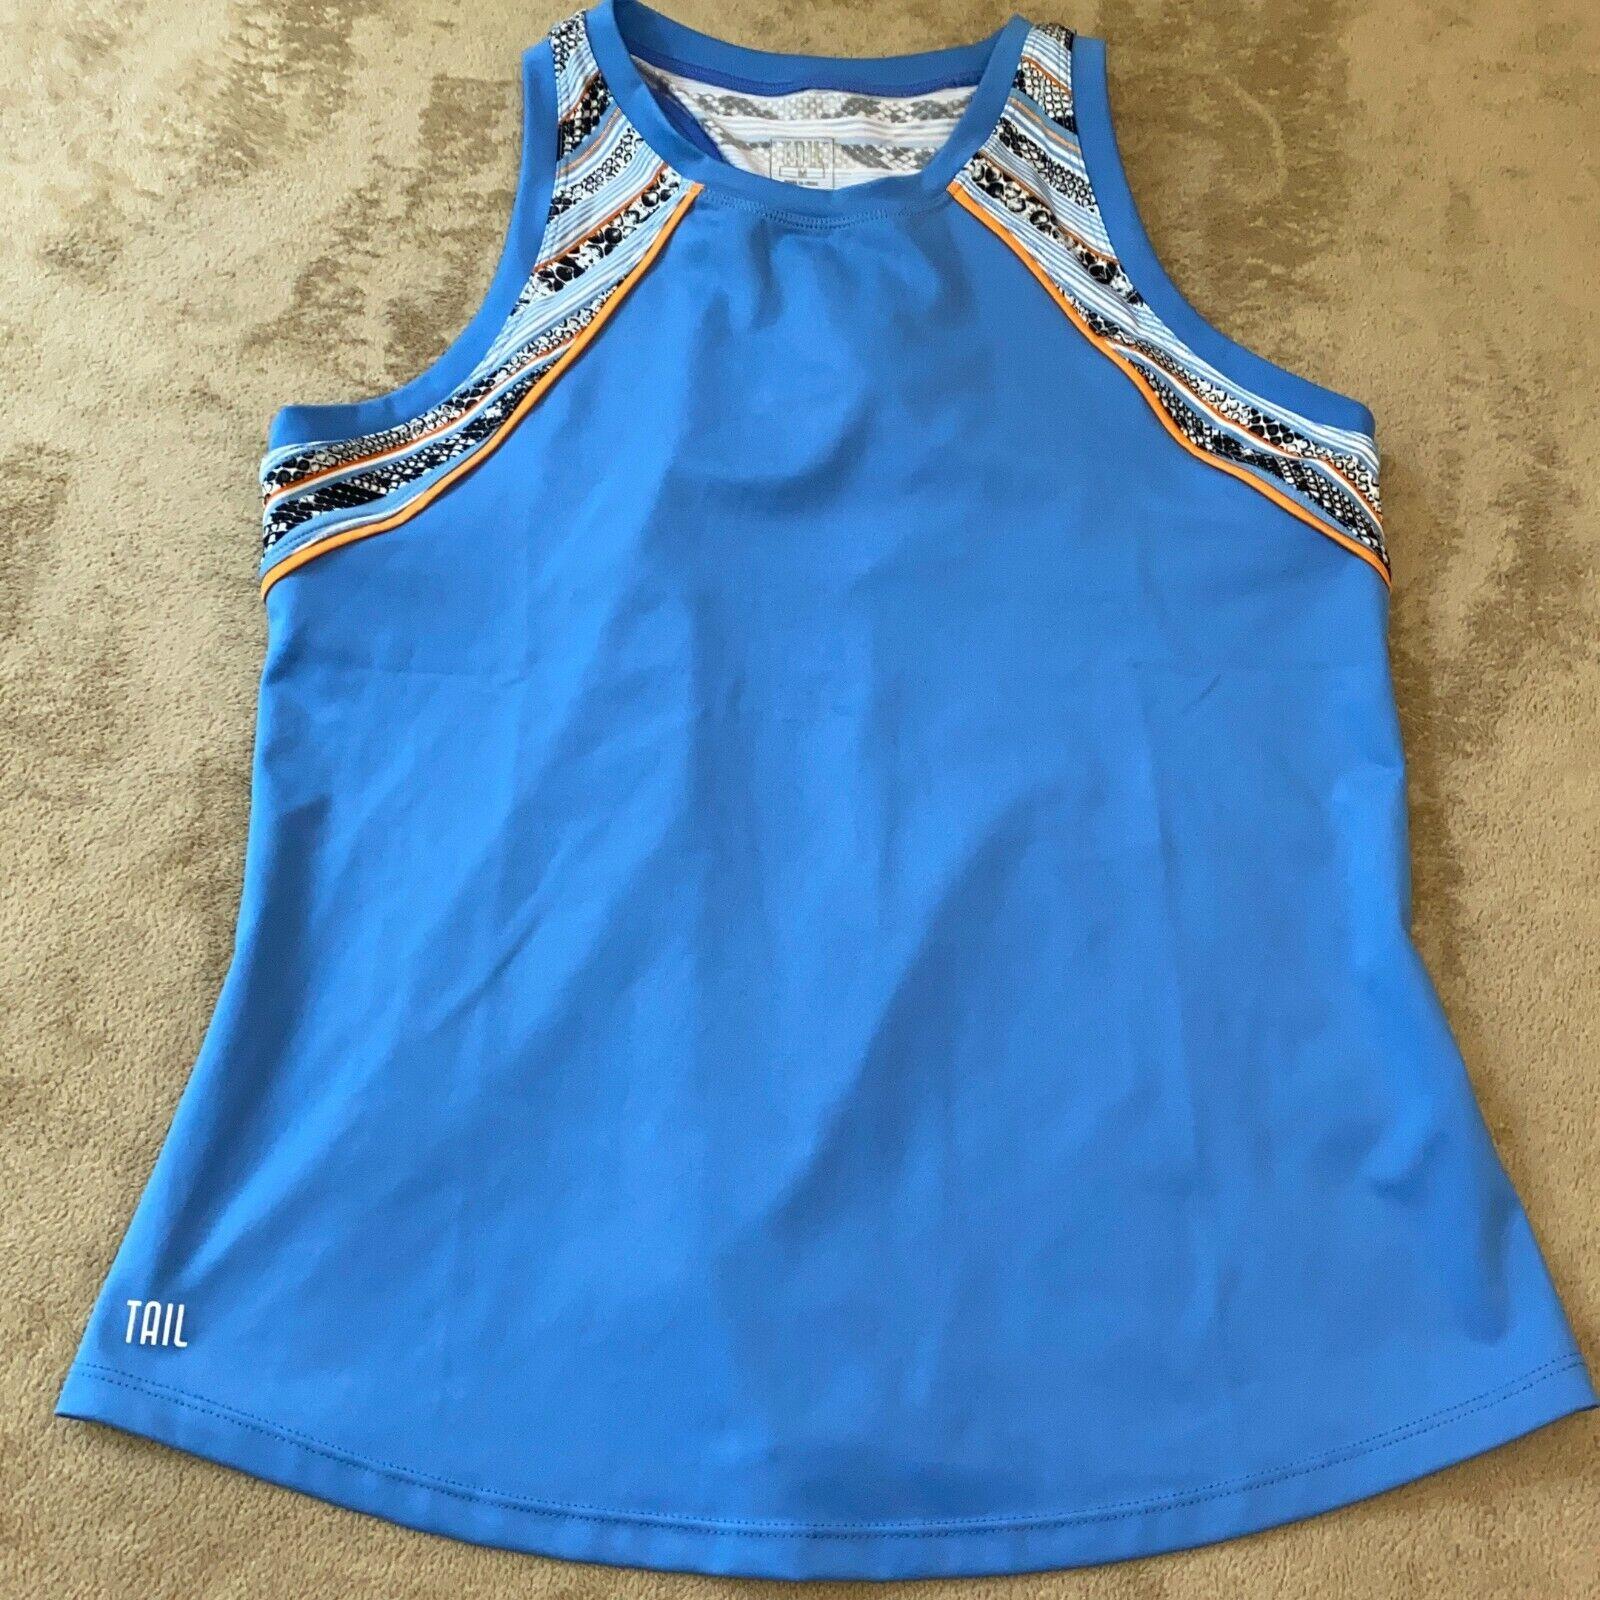 Tail Womens Blue Crew Neck Sleeveless Racerback Athletic Top Size Medium